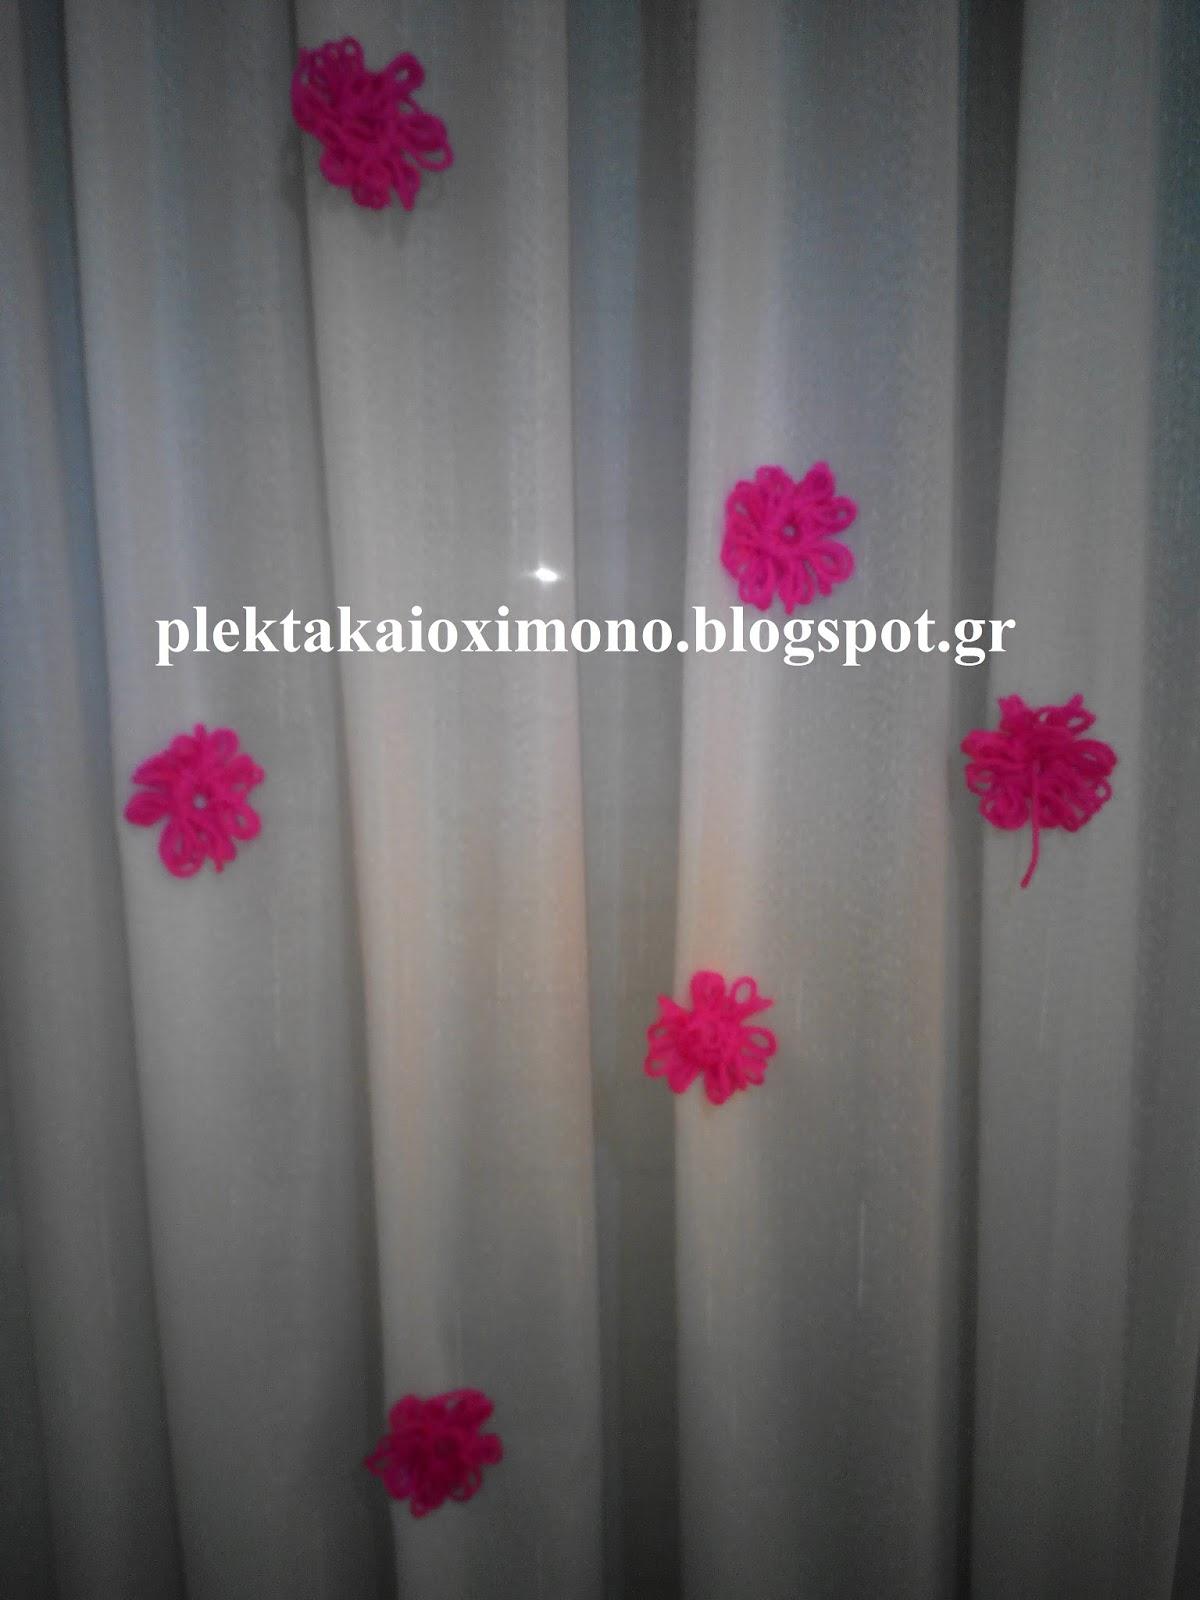 de4d8295ea4c Προσθέστε μερικά λουλούδια στην κουρτίνα σας.Ειδανικό για παιδικά δωμάτια.